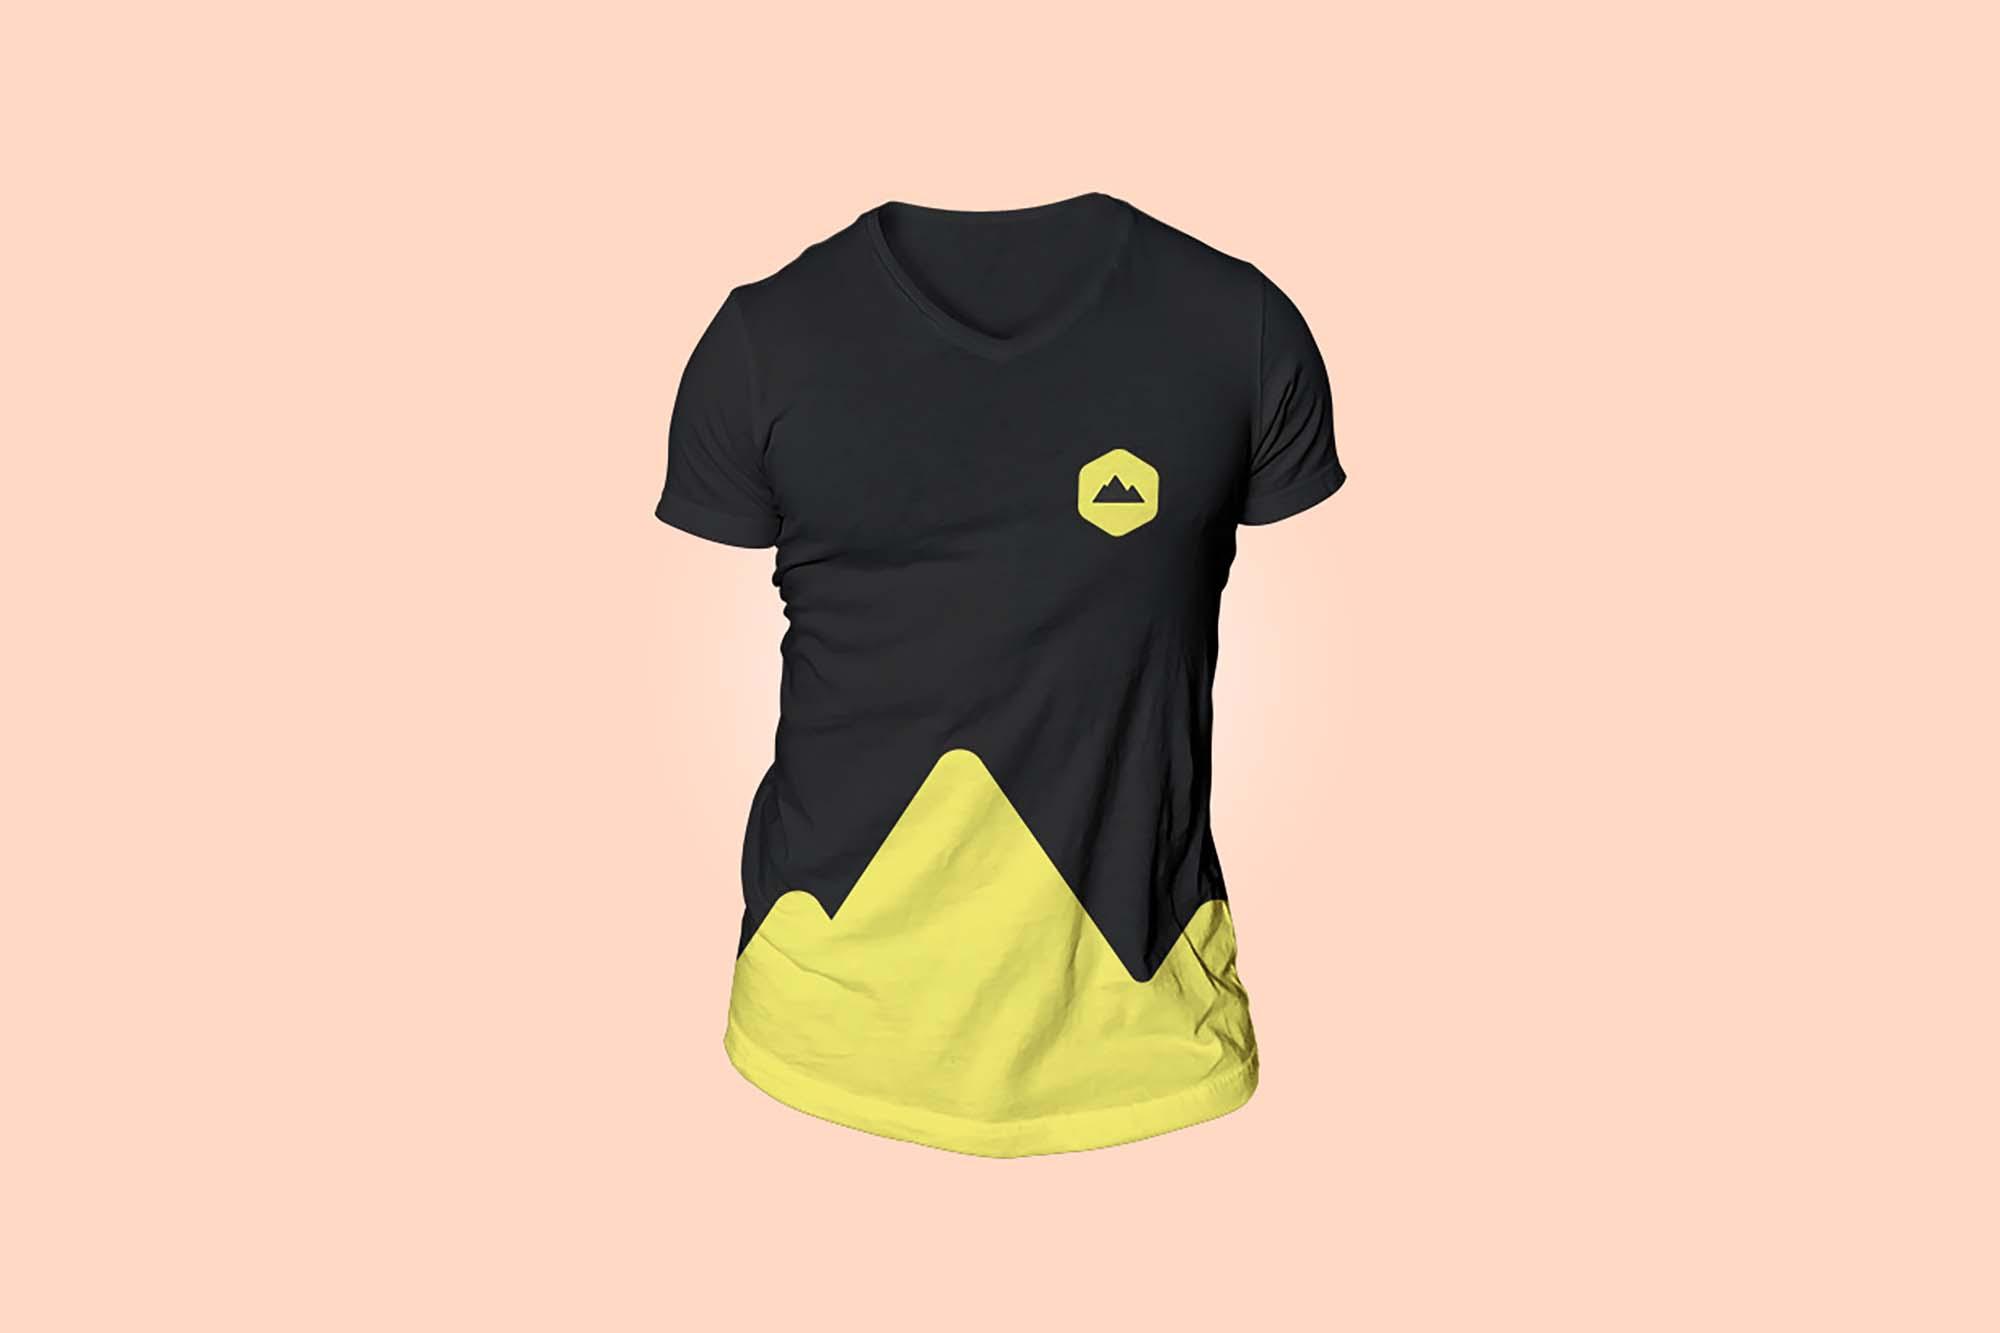 Simple T-Shirt Mockup 2